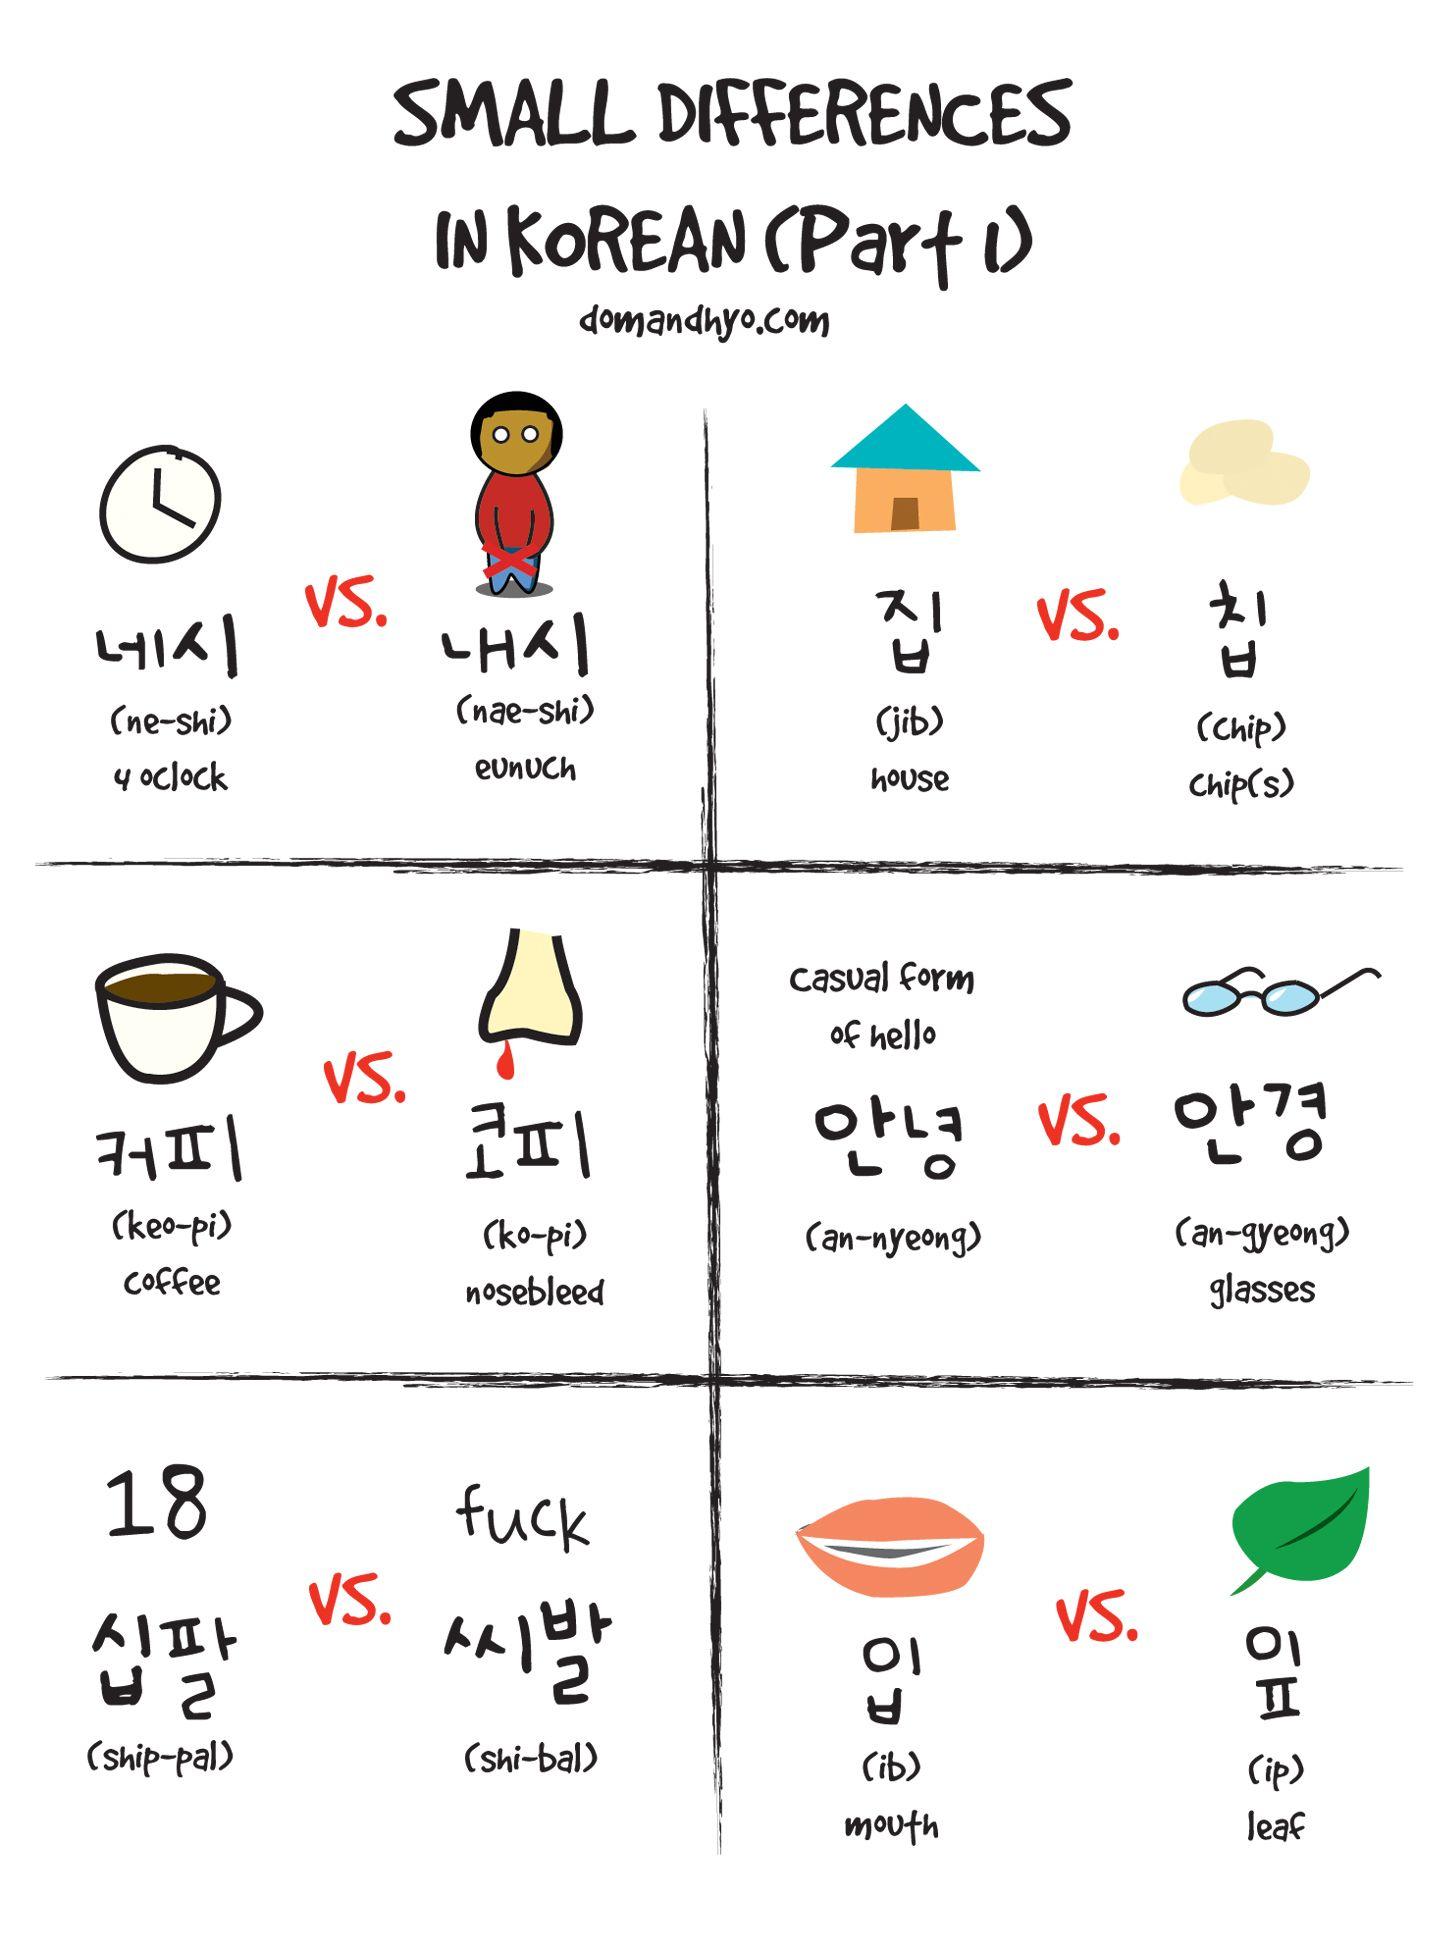 coreano, aprender coreano | Frases coreanas, Aprender ...